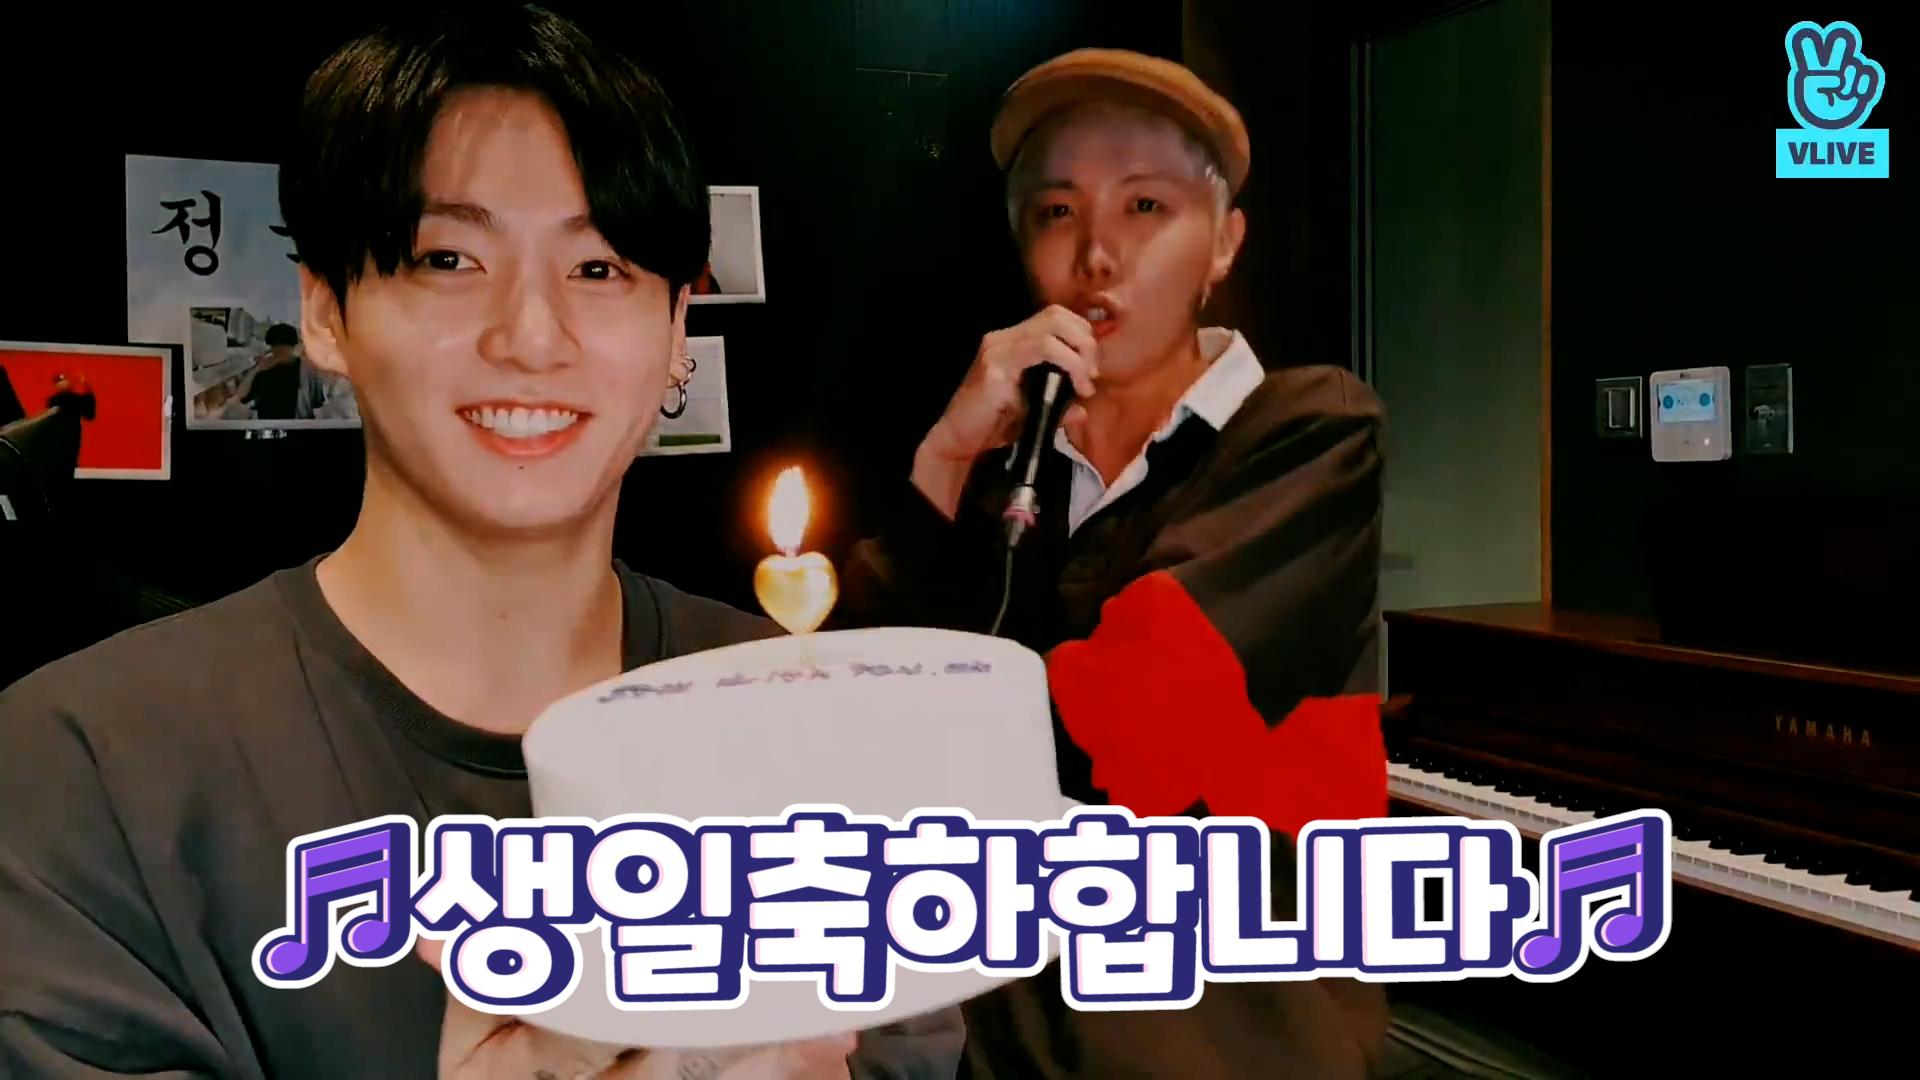 [BTS] 소중한 날 기념!! 노래 만들기 with 천재로맨틱강아지 전정국🎤🎶 (HAPPY JUNGKOOK DAY!)